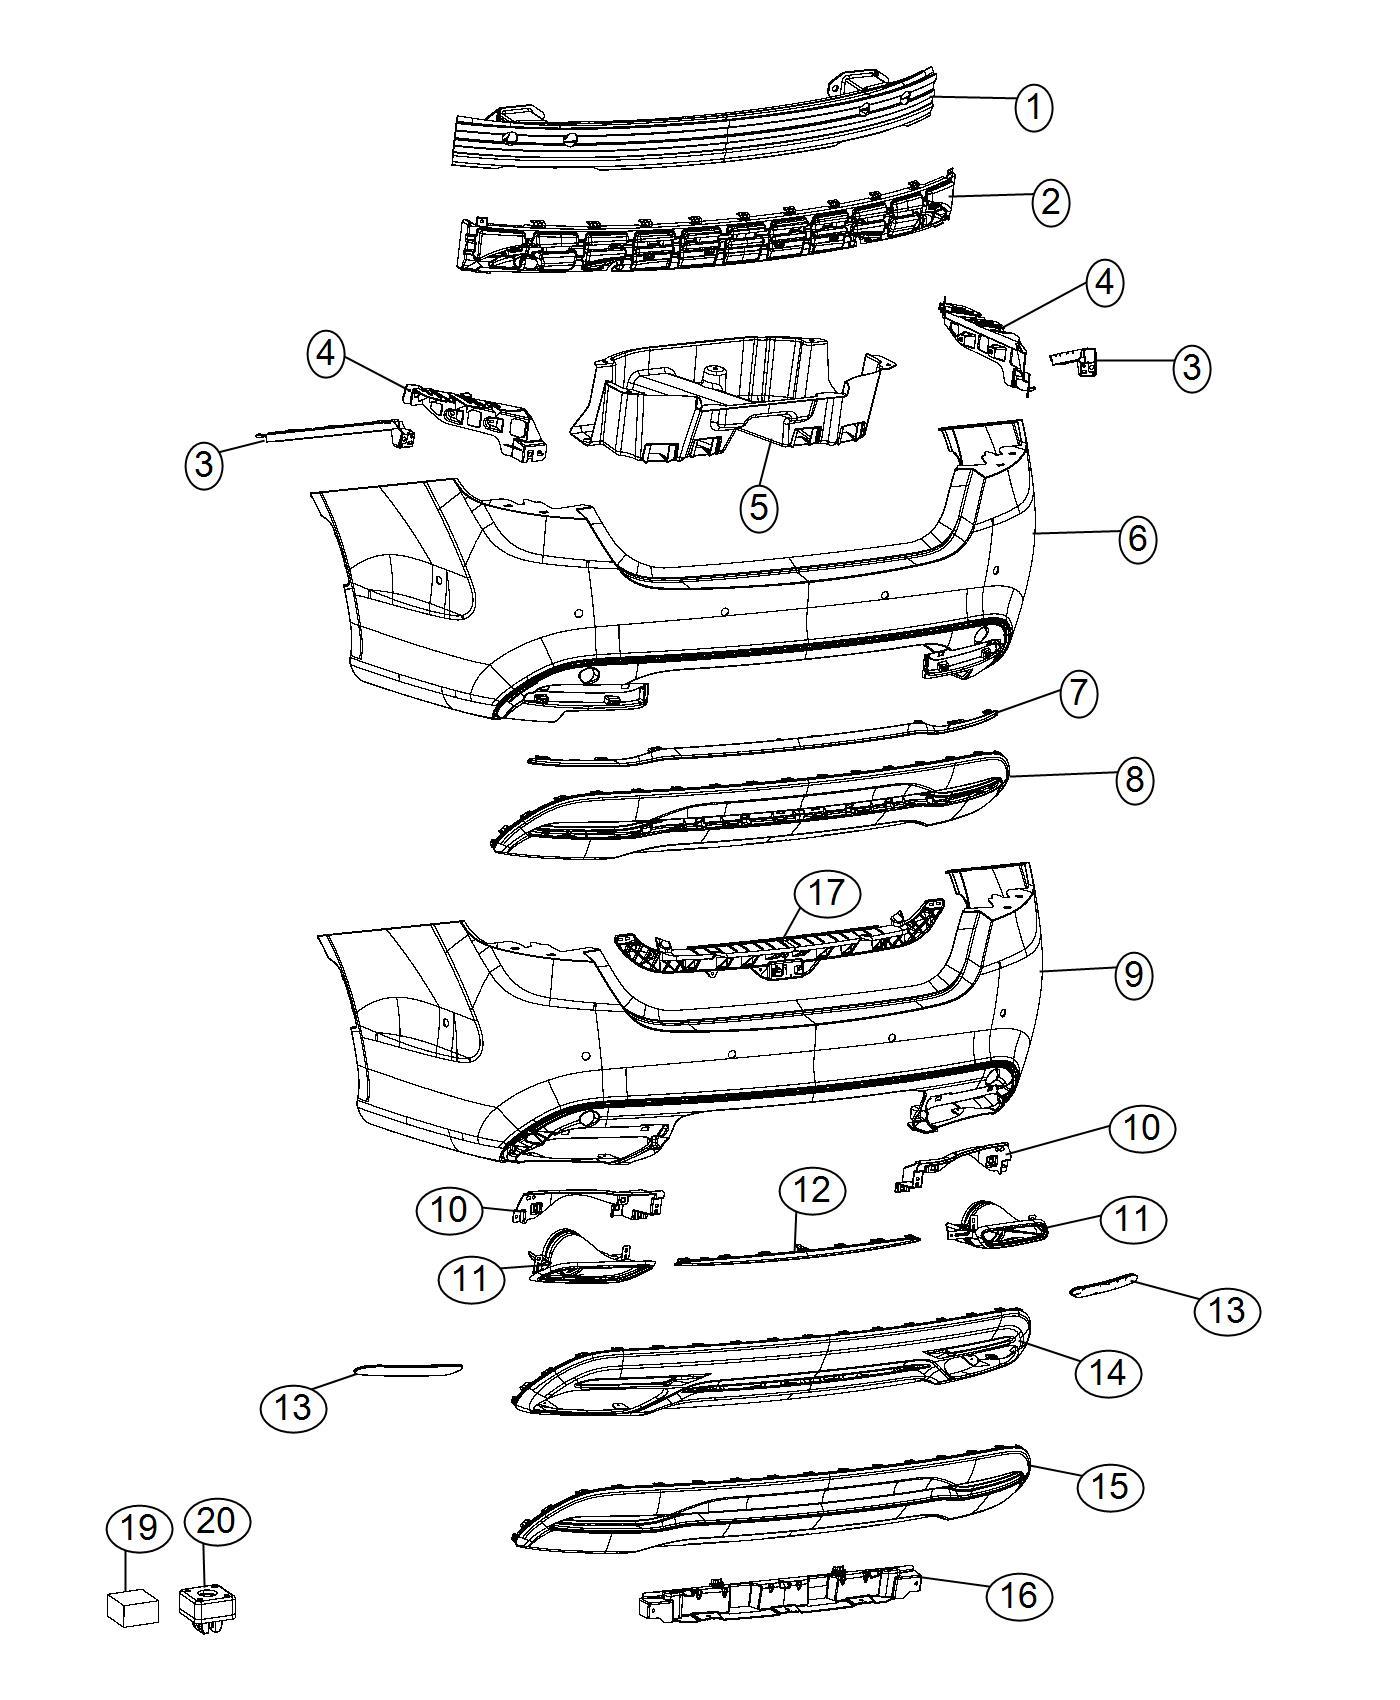 Chrysler 200 Fascia Rear Lower Ne8 X8w Ne8